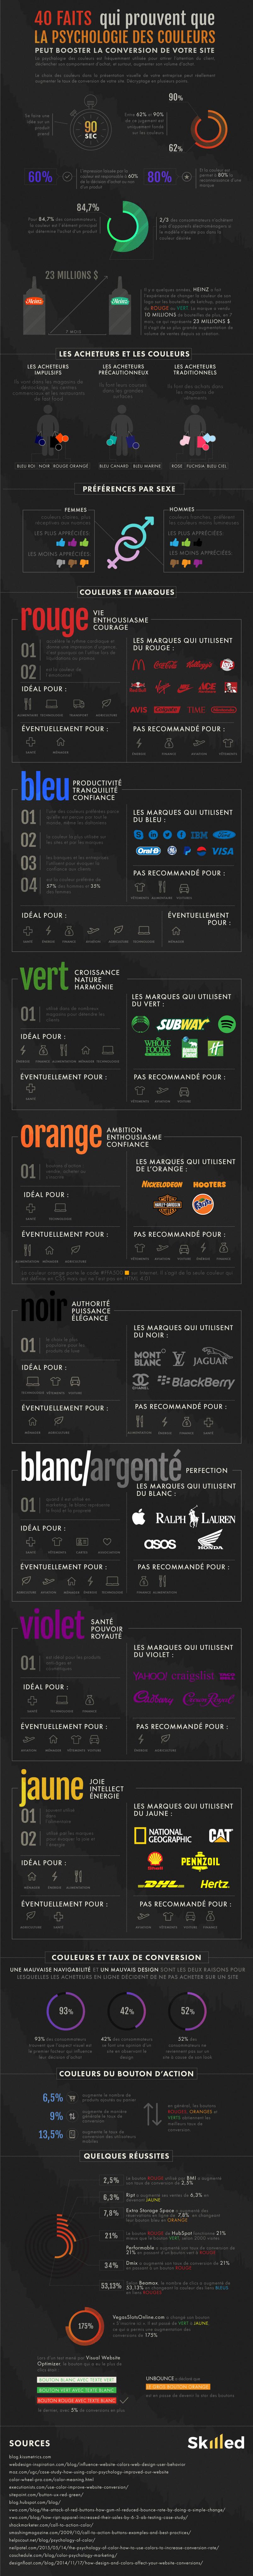 infographie couleurs